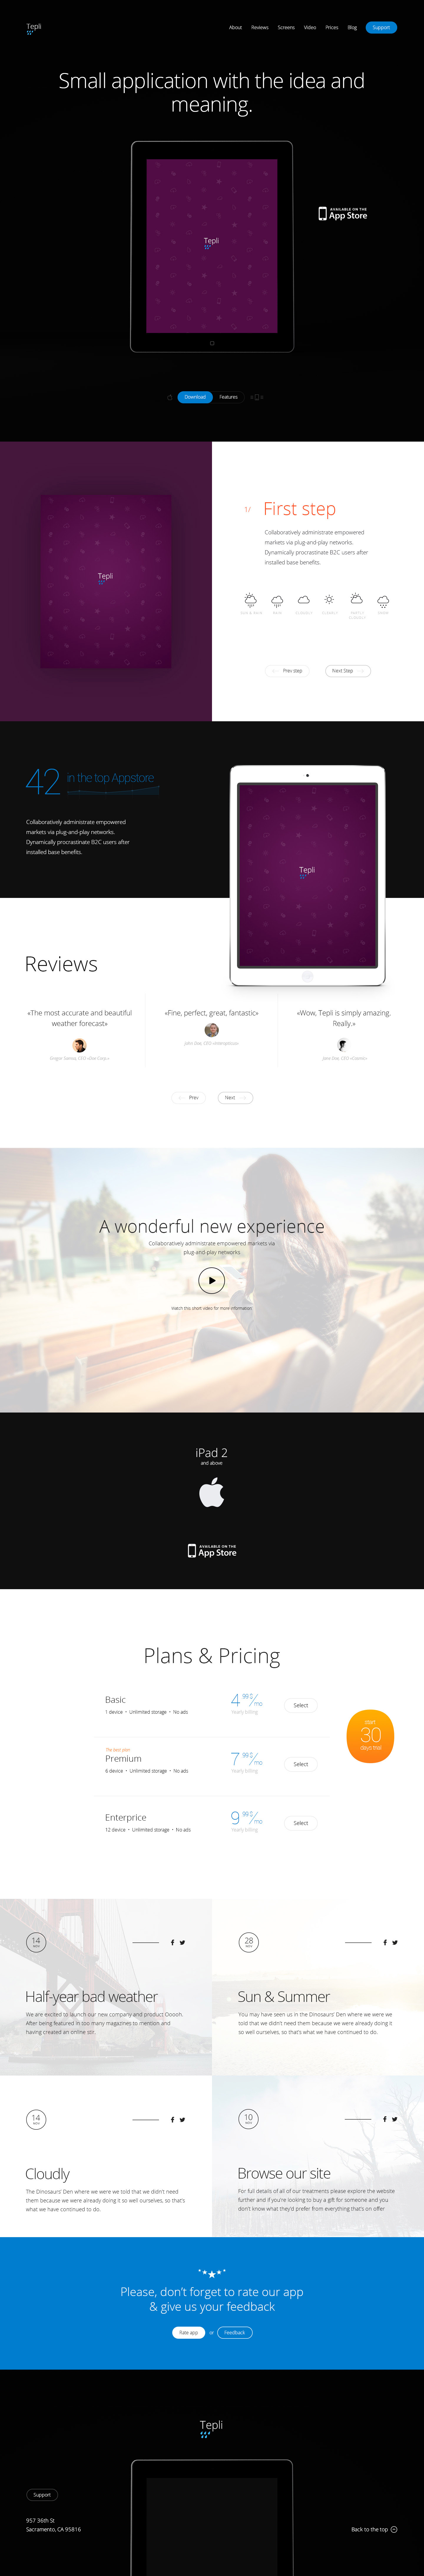 tepli_homepage_ipad